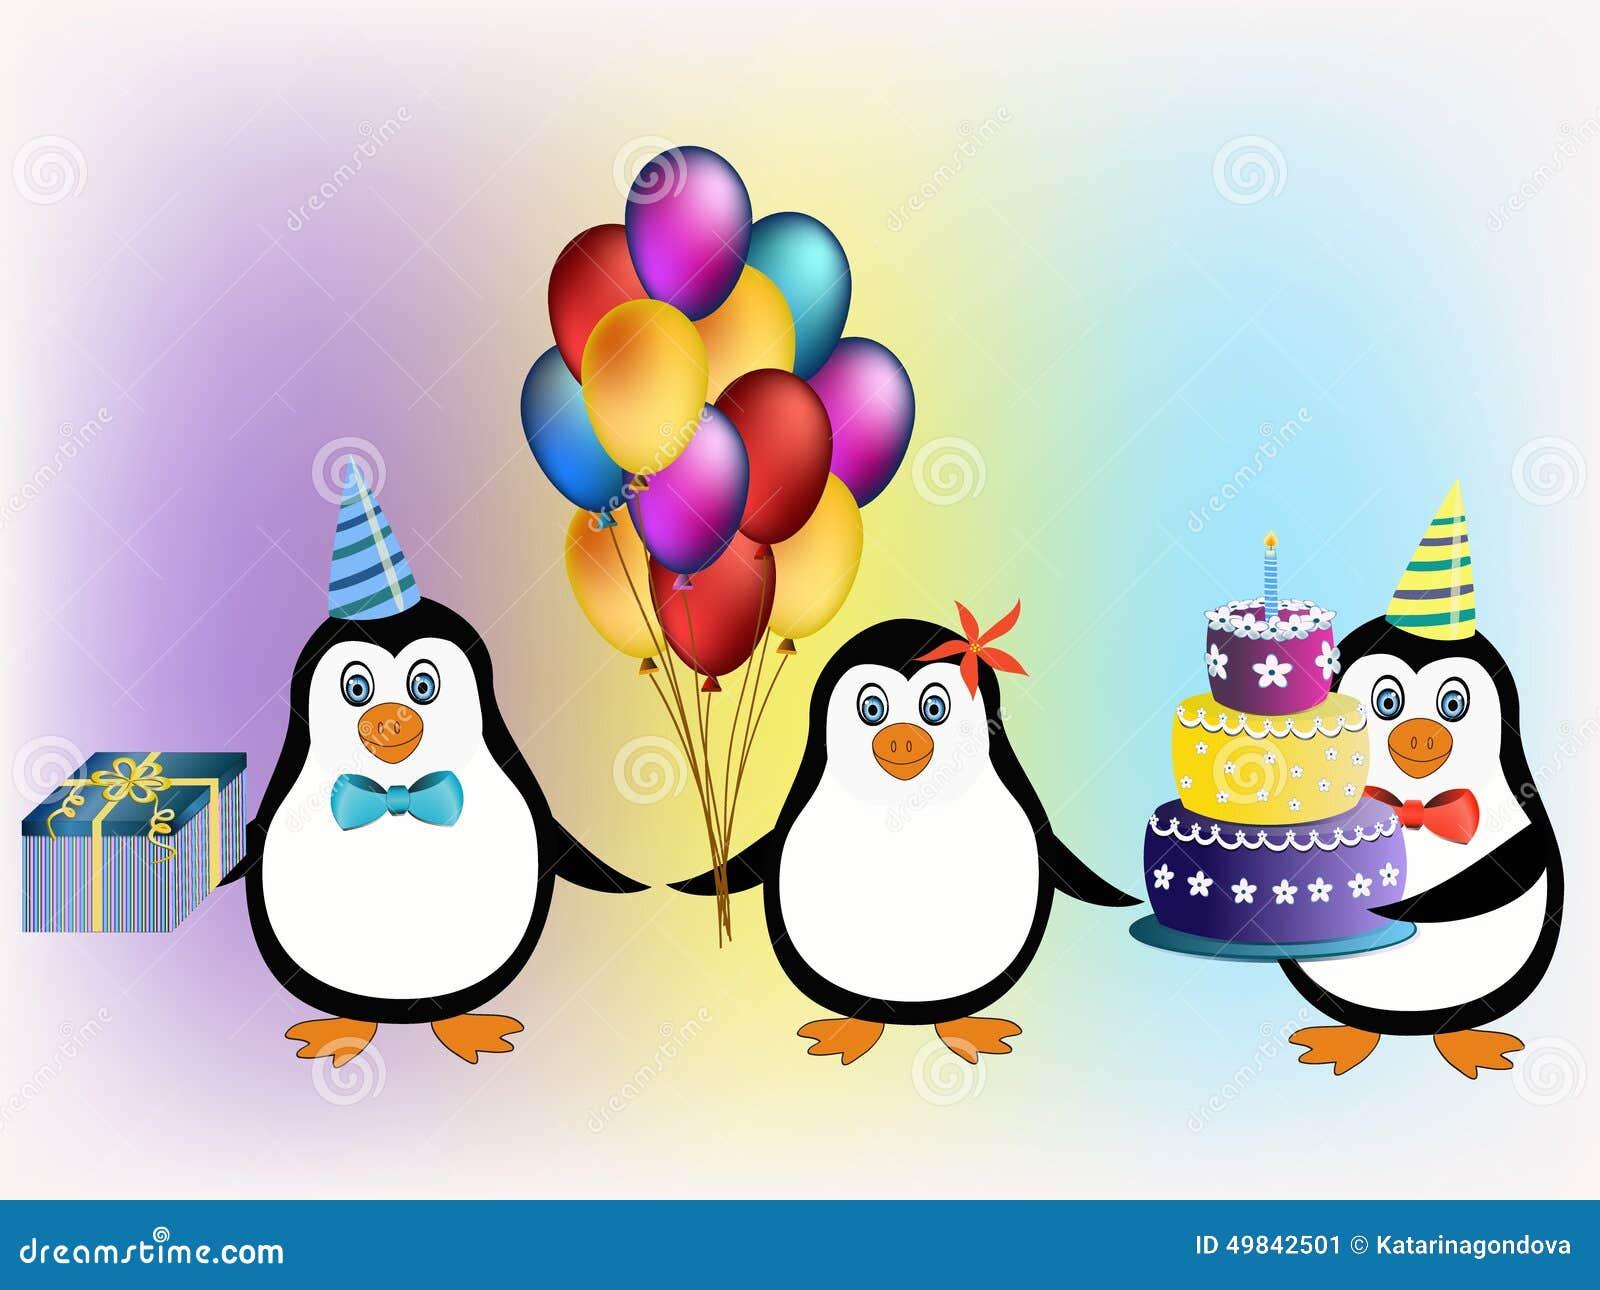 Download Birthday Celebration Song